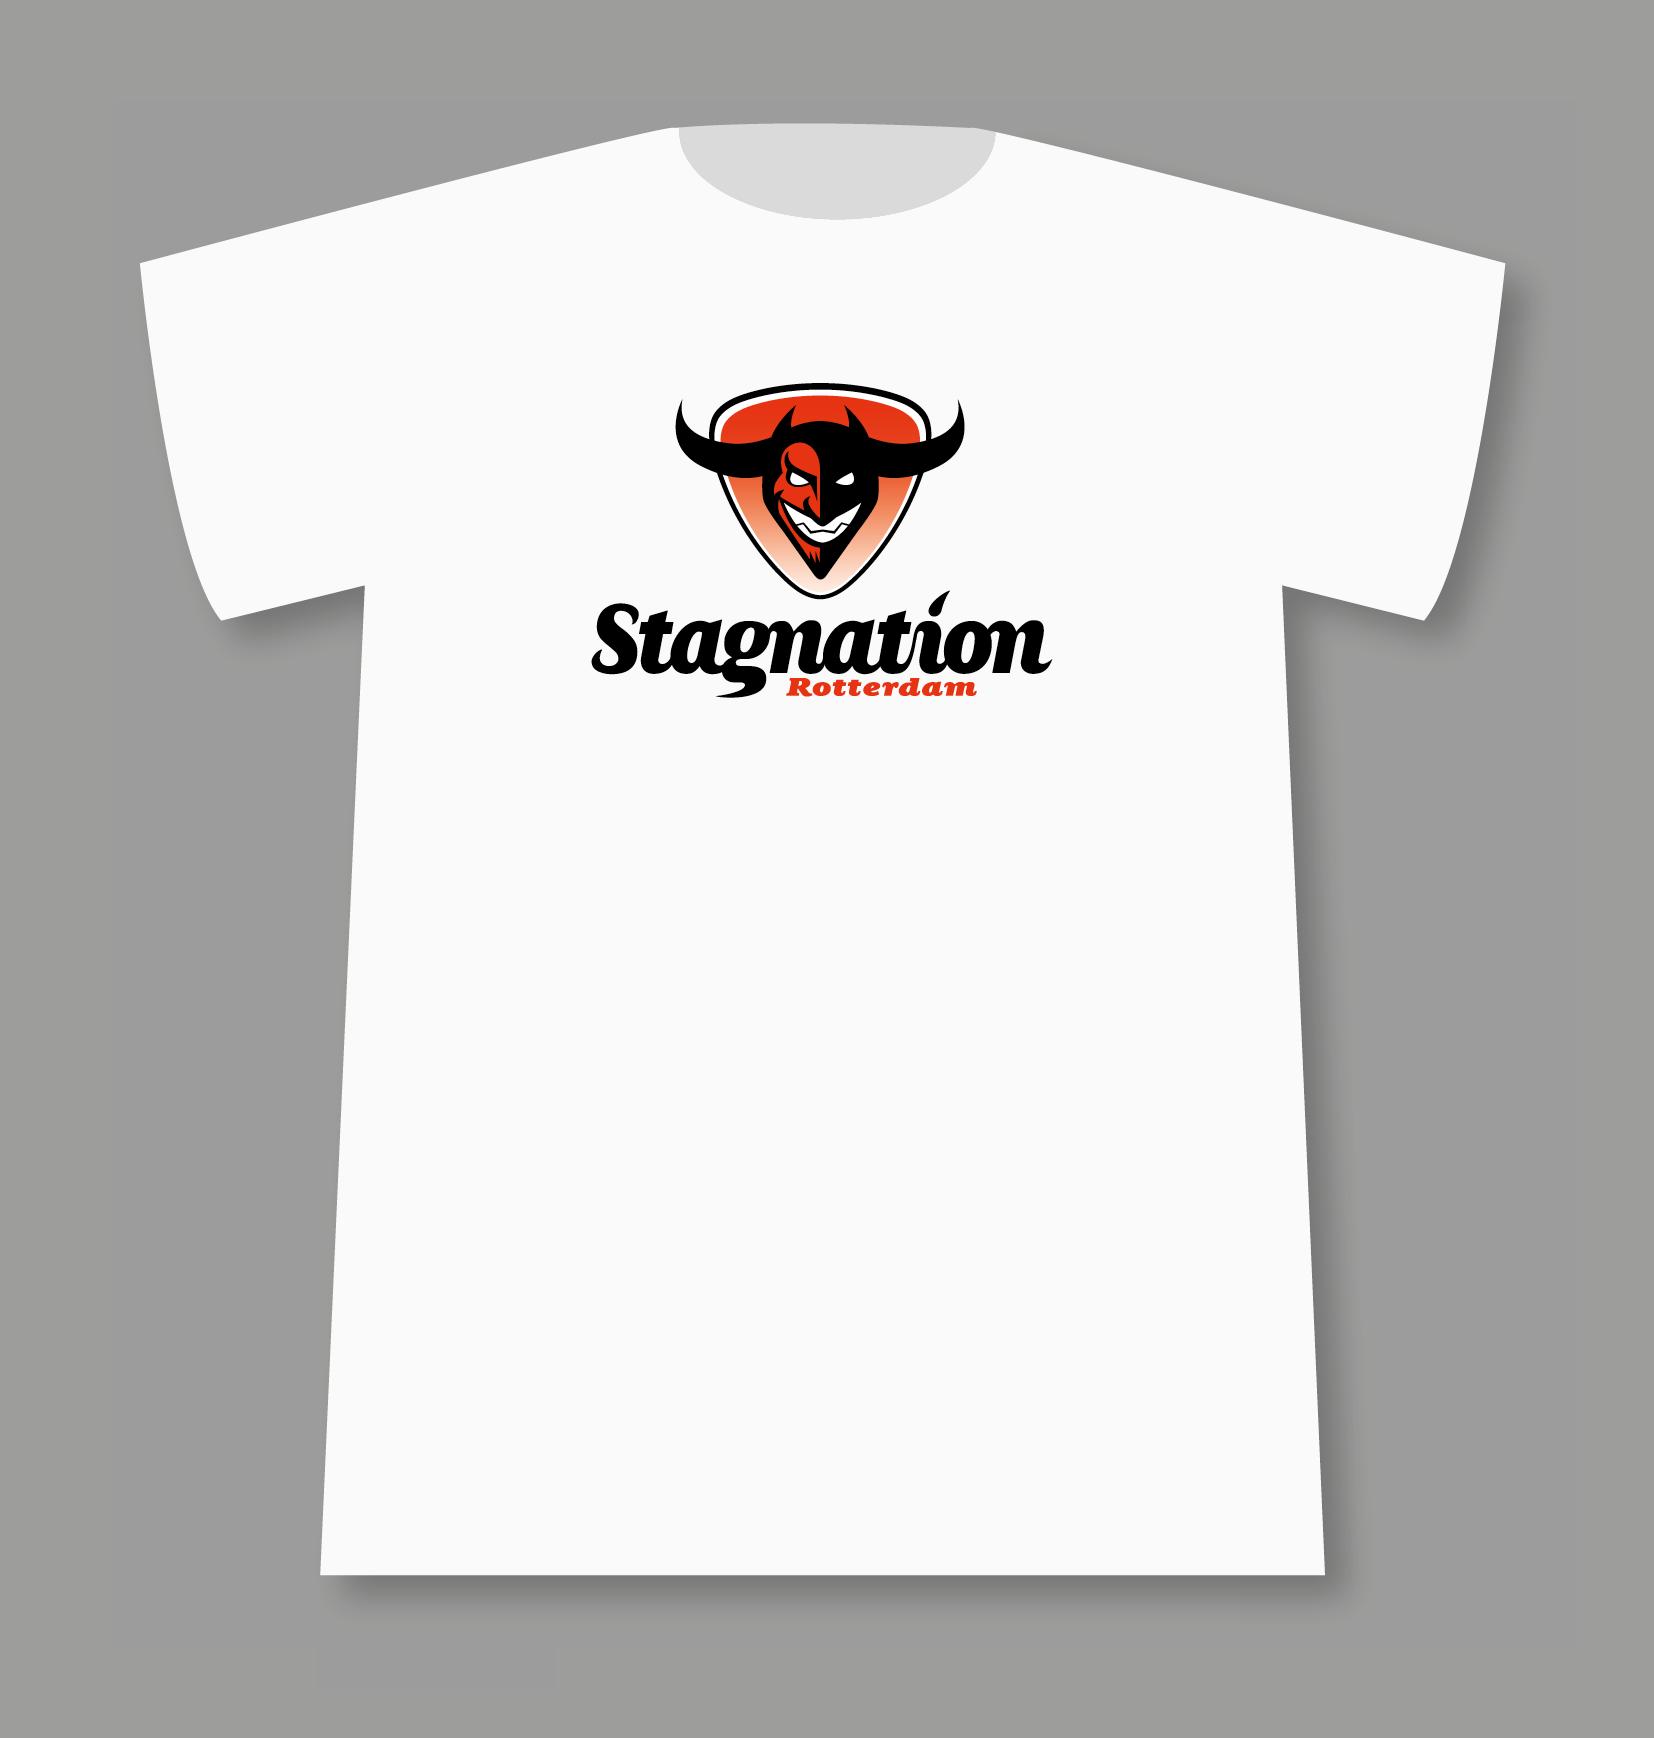 Ontwerp_T-Shirts_Stagnation3